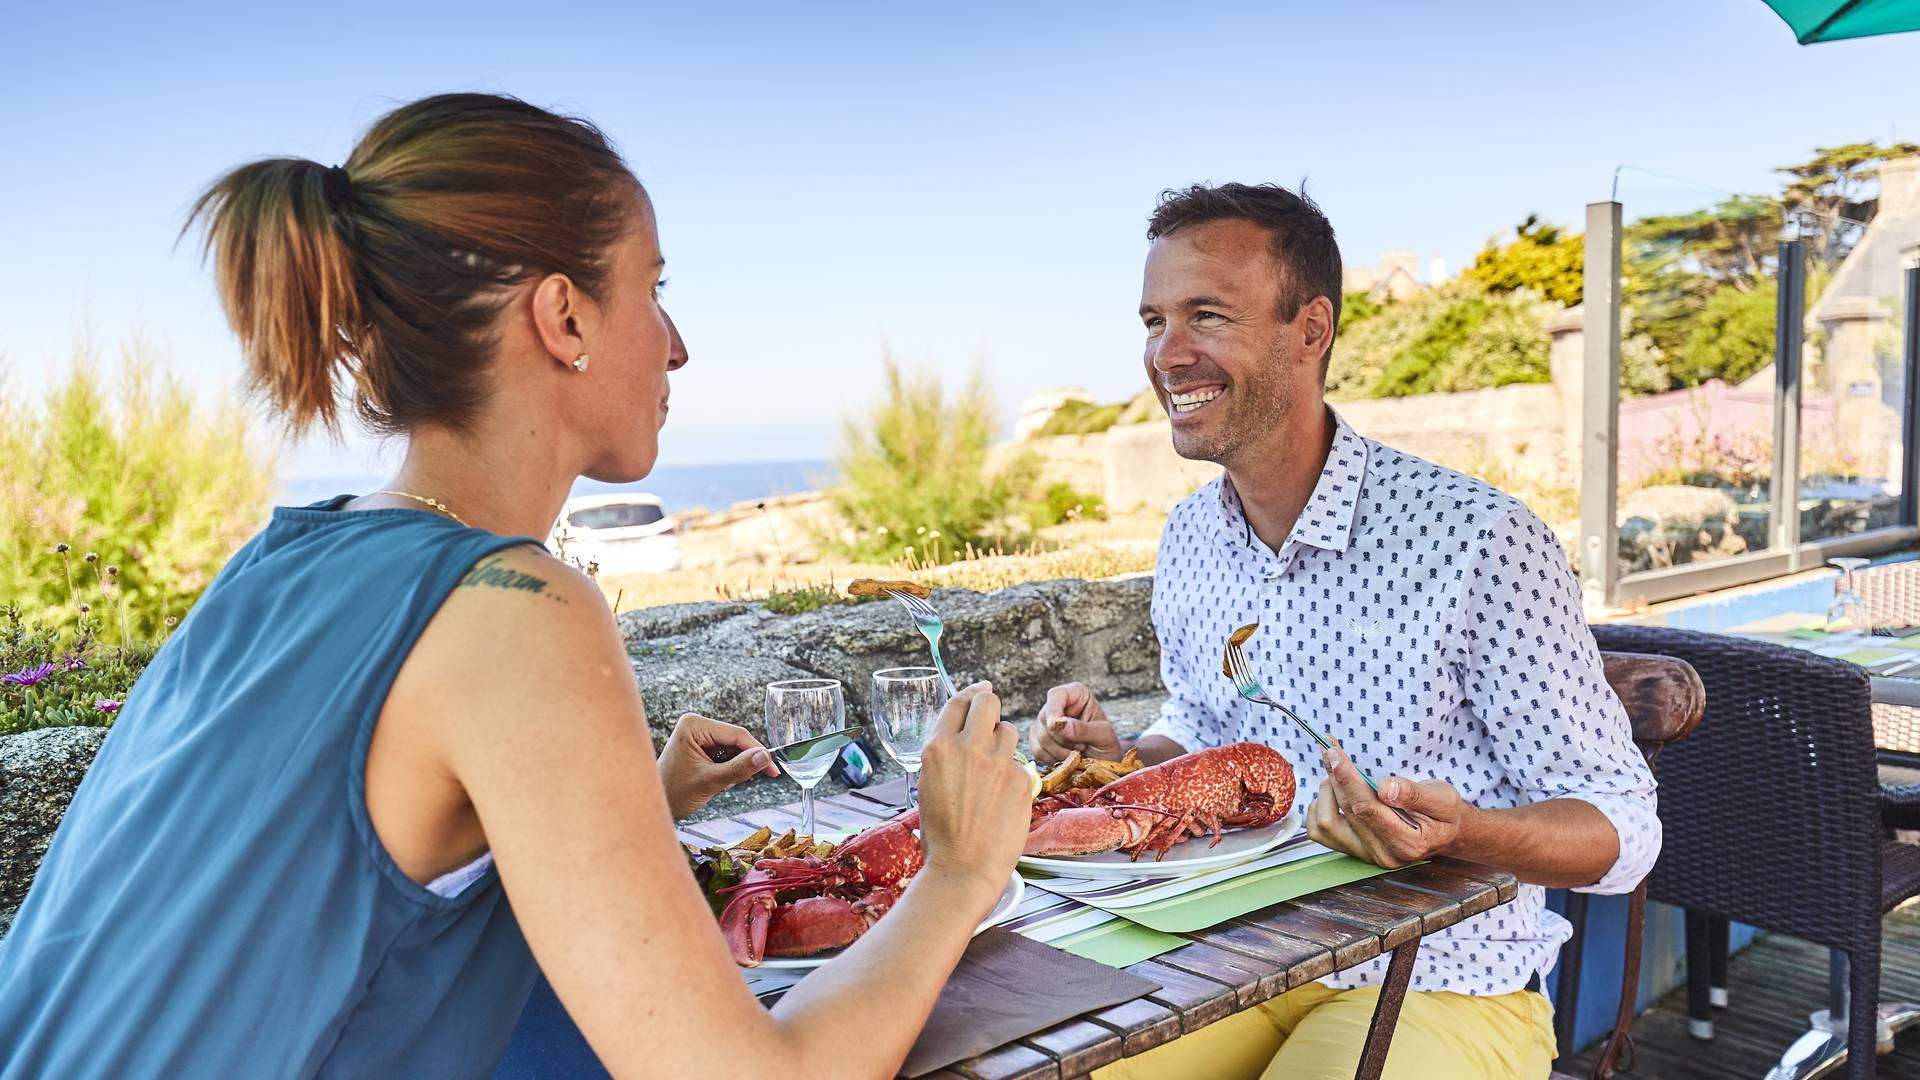 Déjeûner ou dîner en terrasse © A Lamoureux